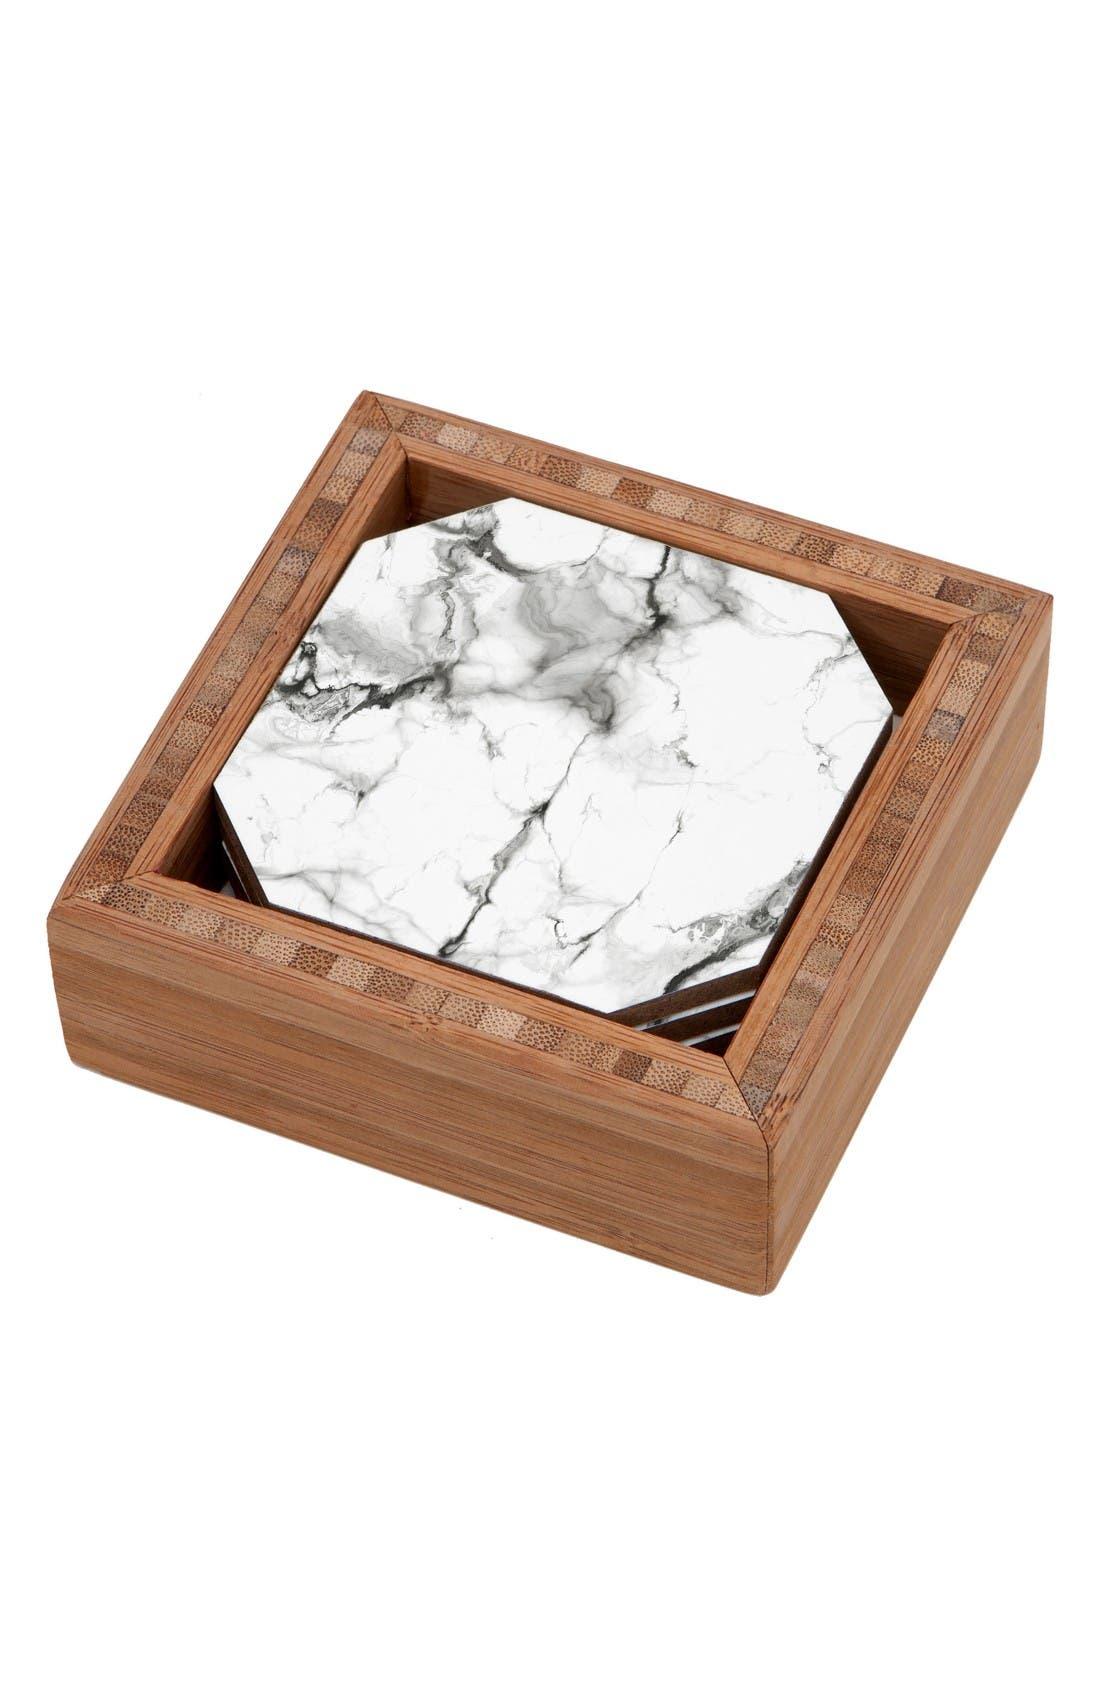 Main Image - Deny Designs Marble Set of 4 Coasters